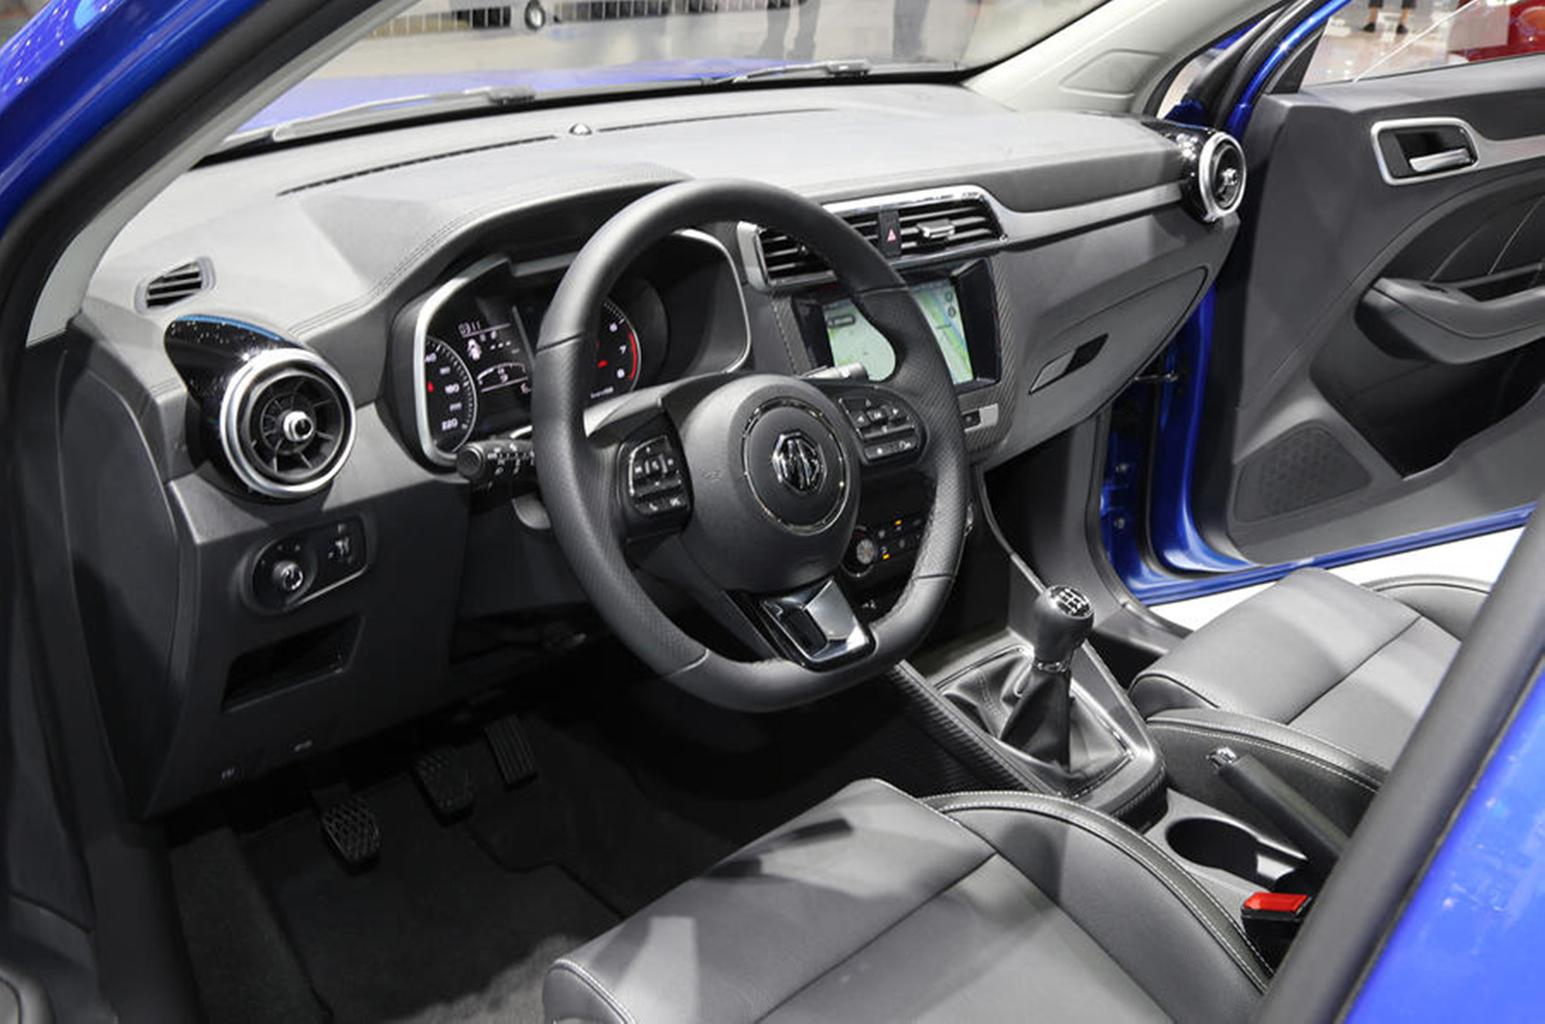 New MG XS SUV revealed